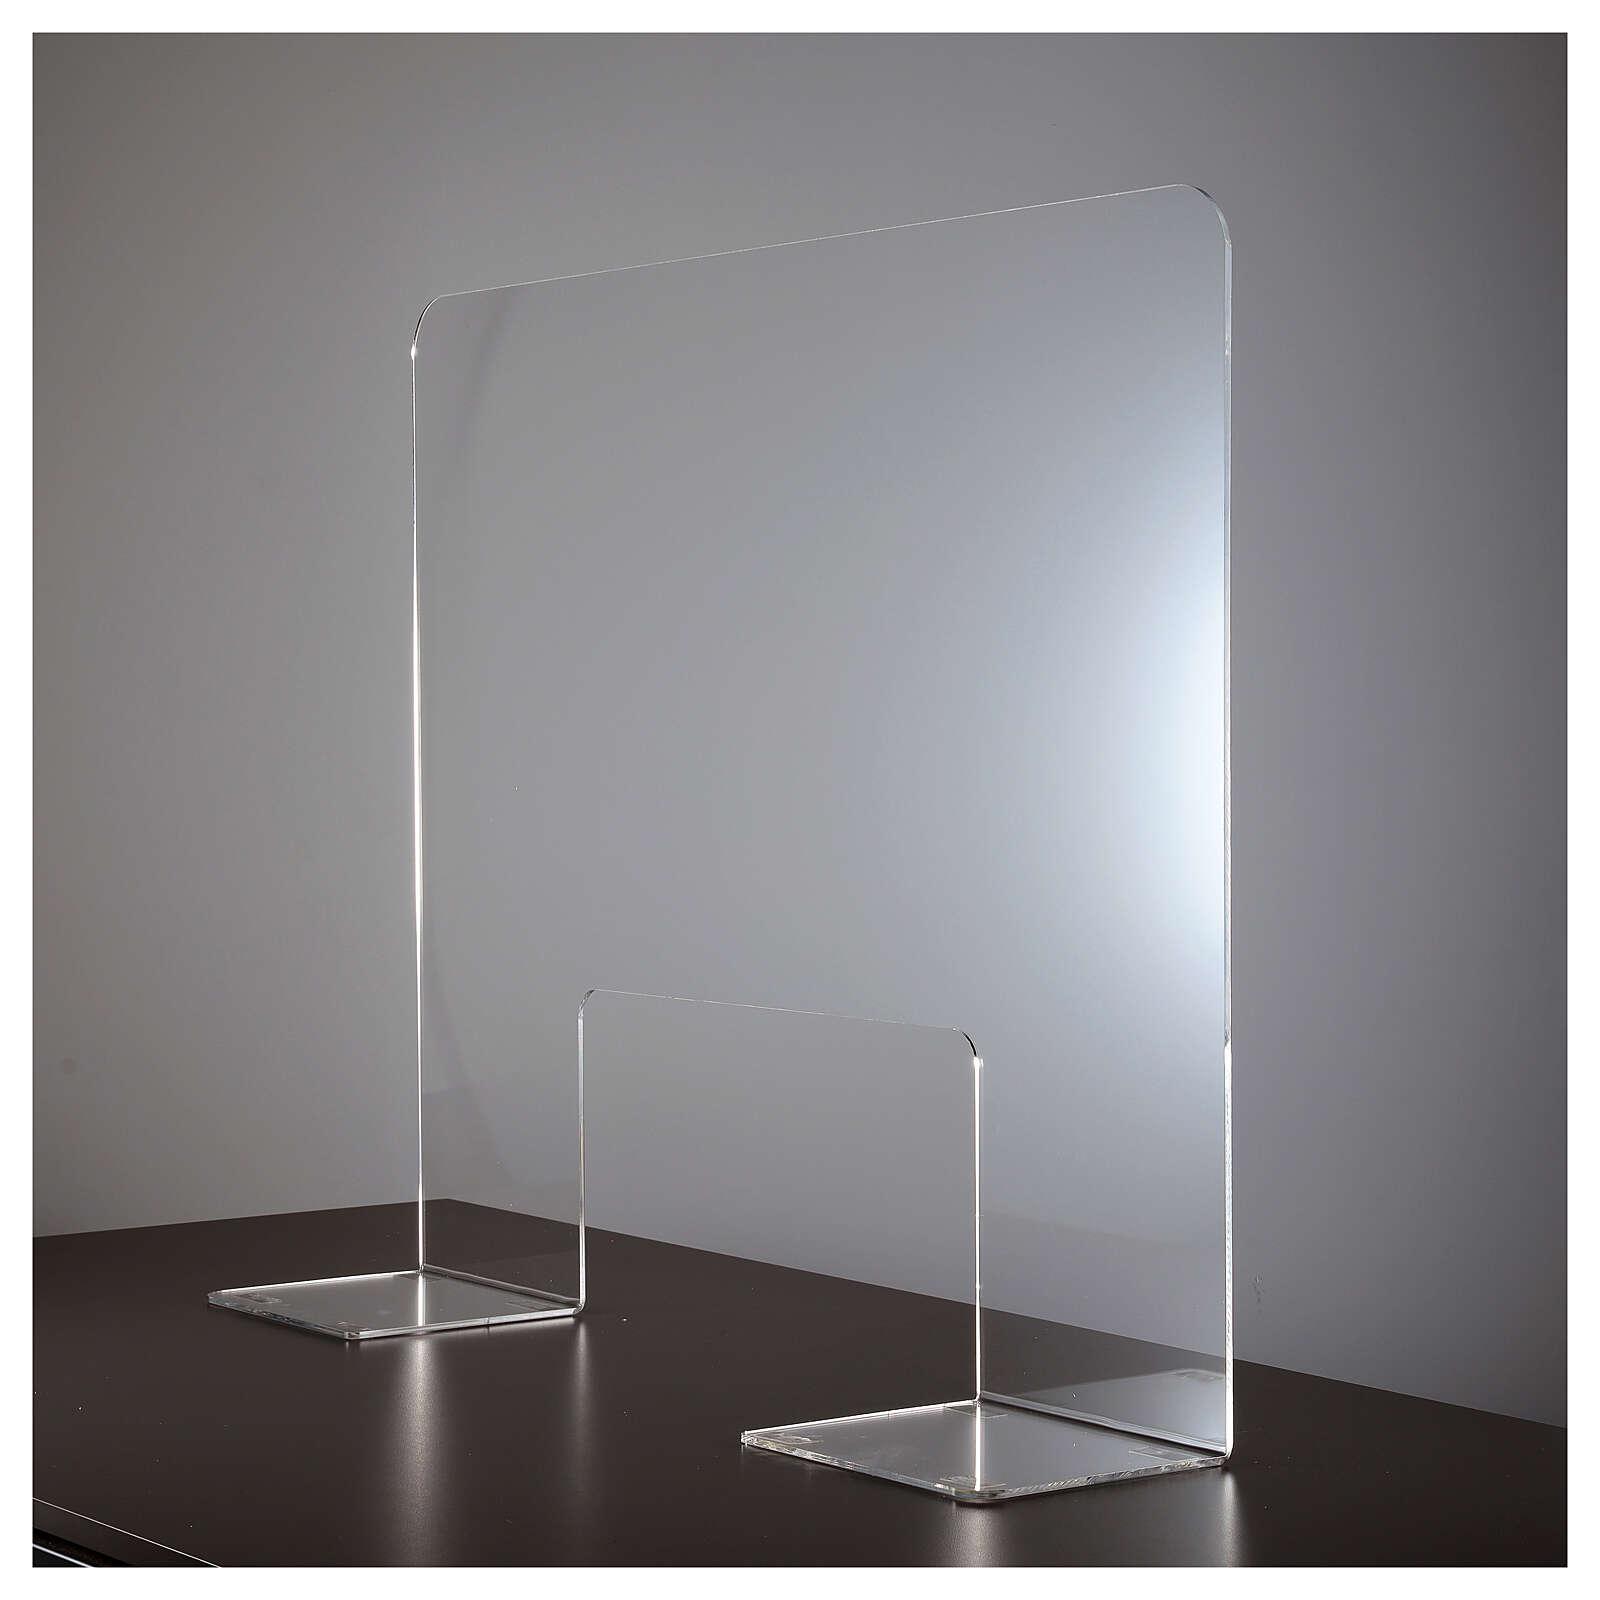 Panel divisorio protector plexiglás 80x100 cm ventana 30x50 cm 3